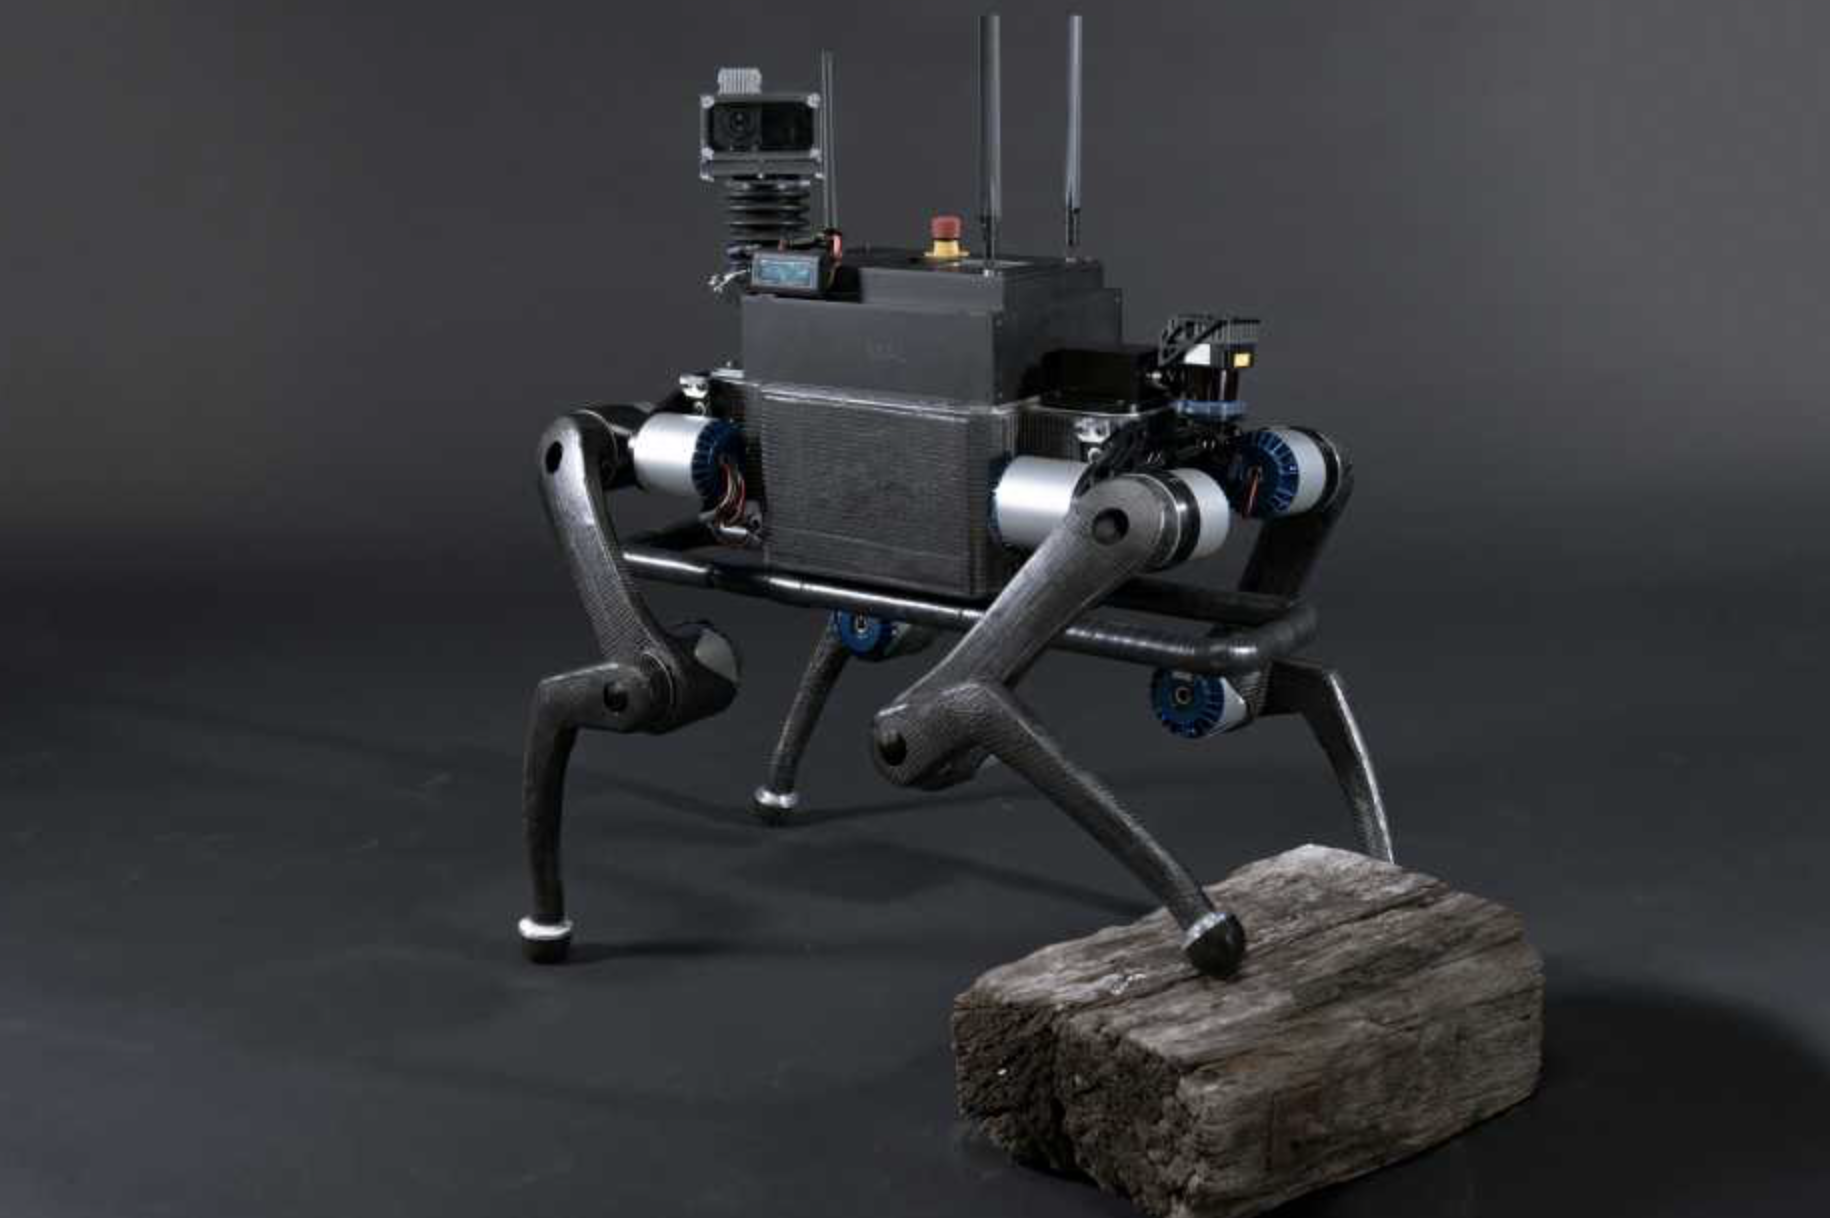 ANYmal Robot Image 3